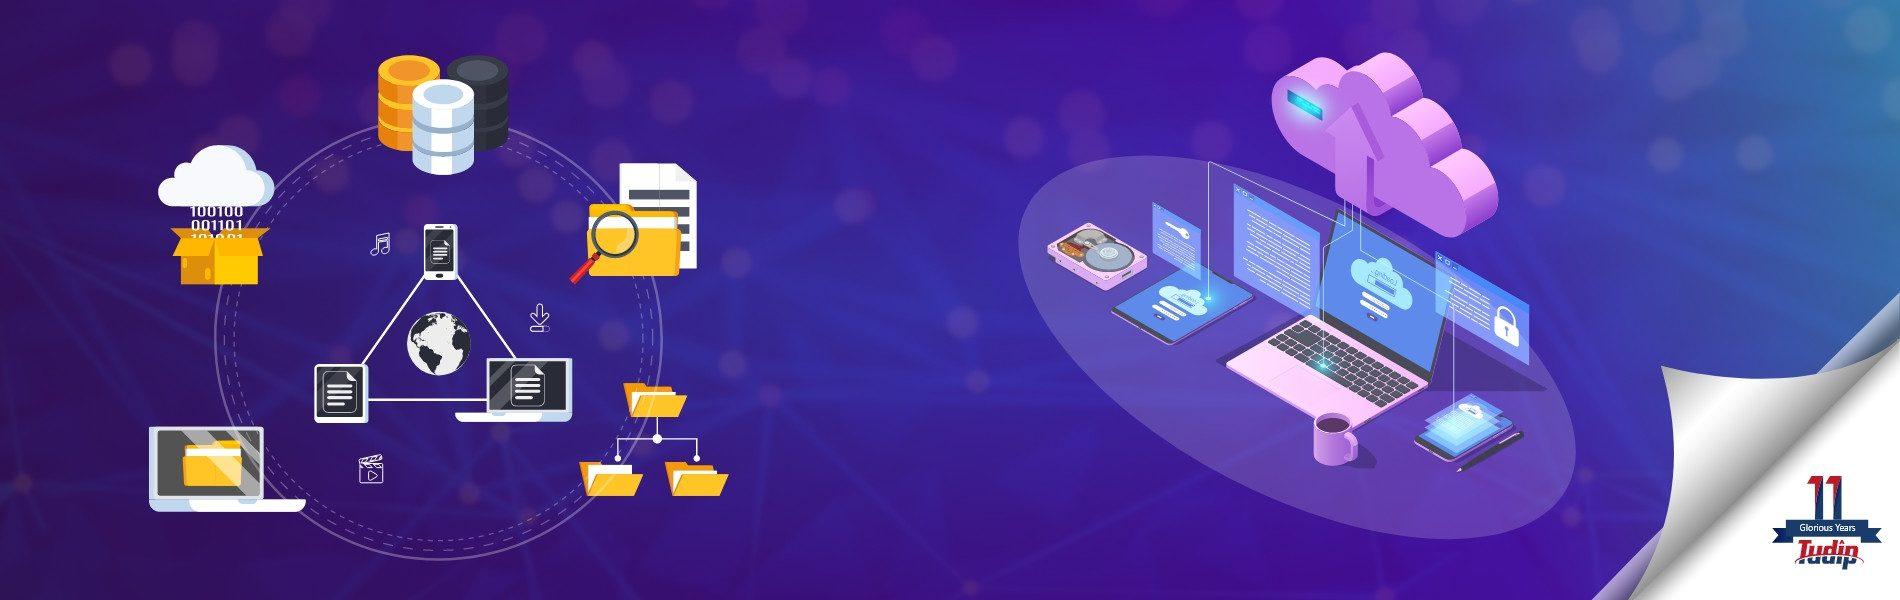 Data Backup: Importance & the Different Data Backup Storage Options